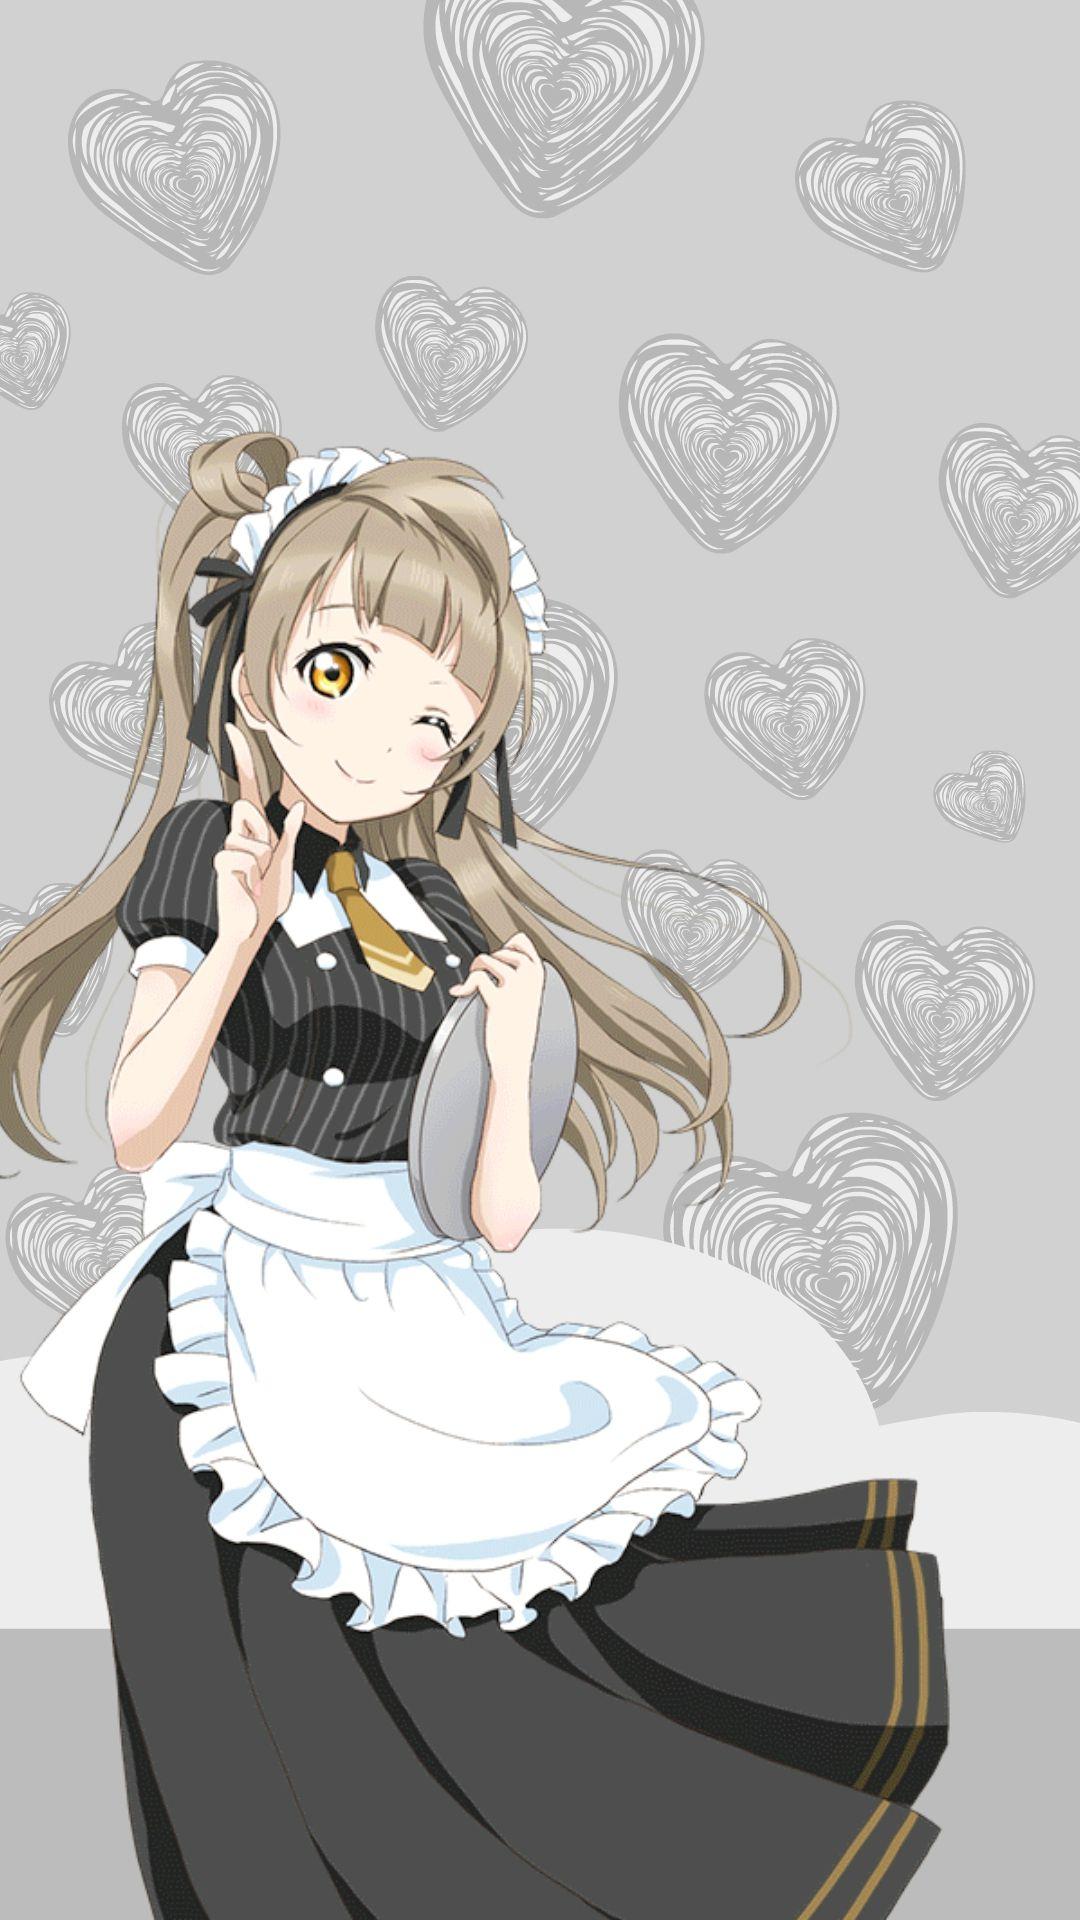 Vocaloid iphone wallpaper tumblr - Iphone Wallpapers Manga Art Anime Art Sunshine Idol Live School Beautiful Vocaloid